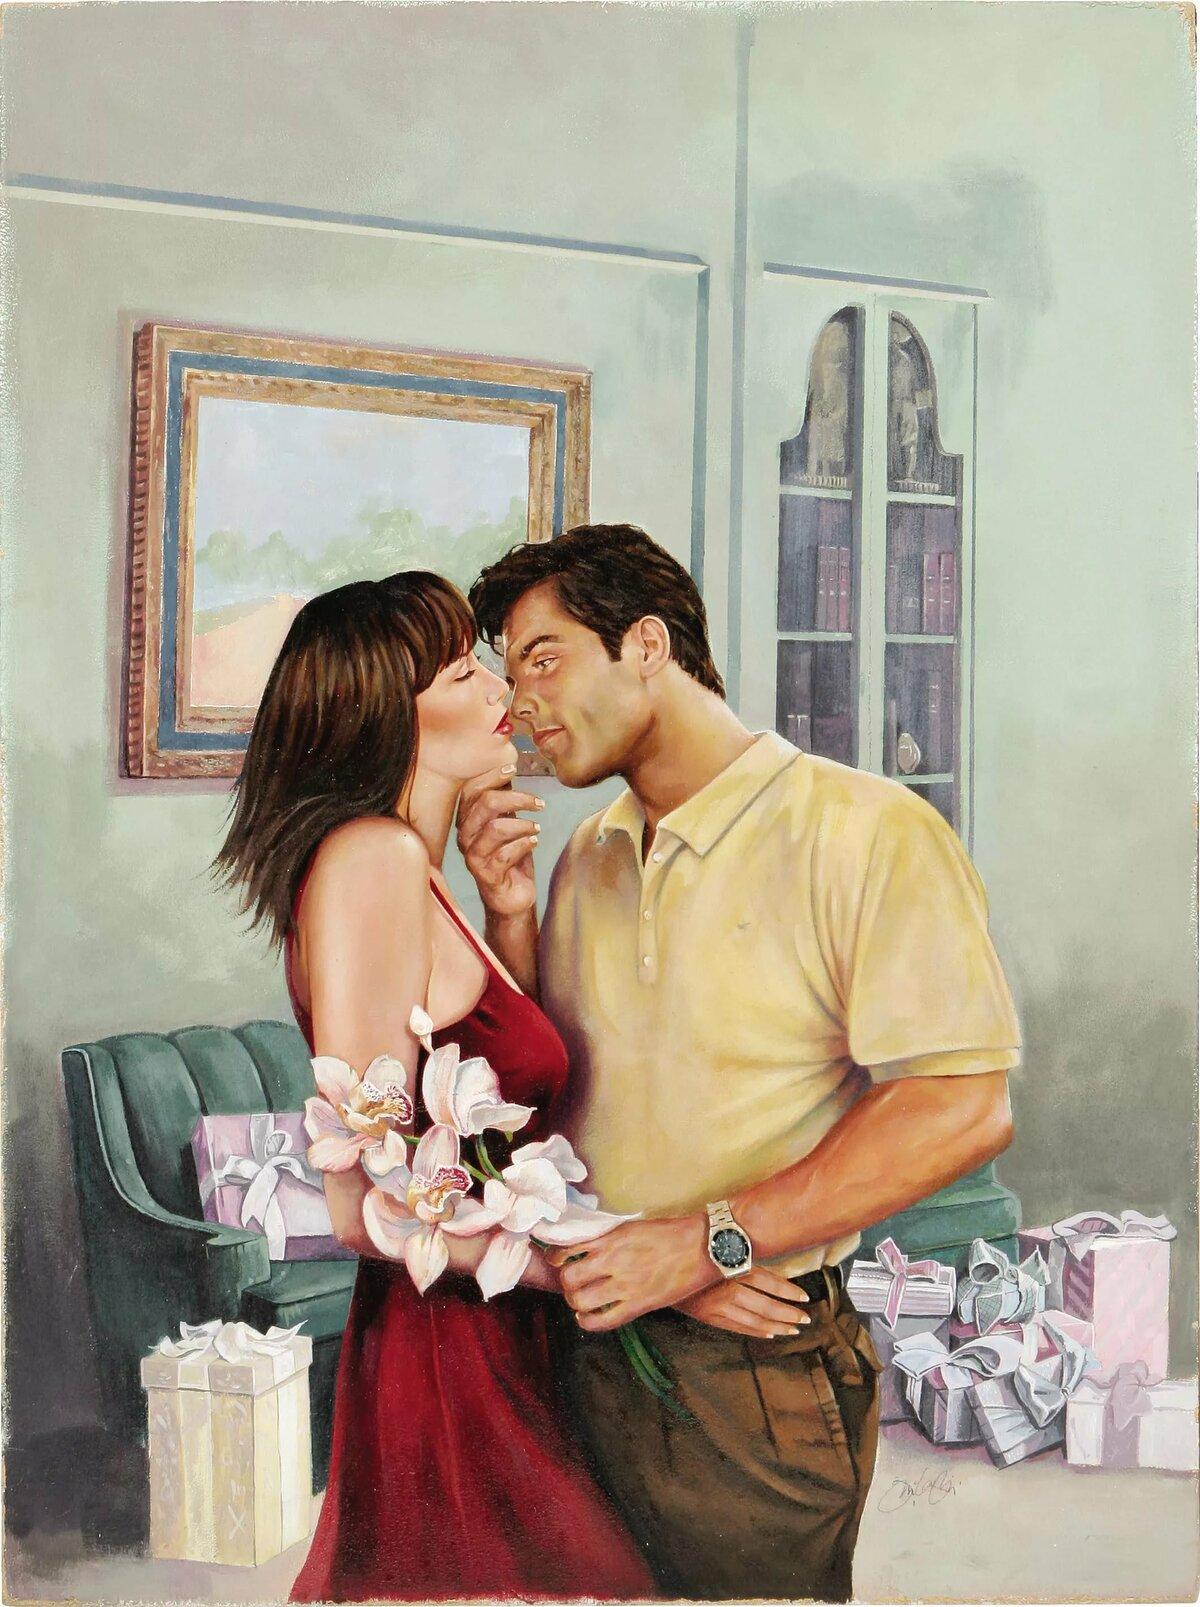 Продукция, открытки жена и любовница